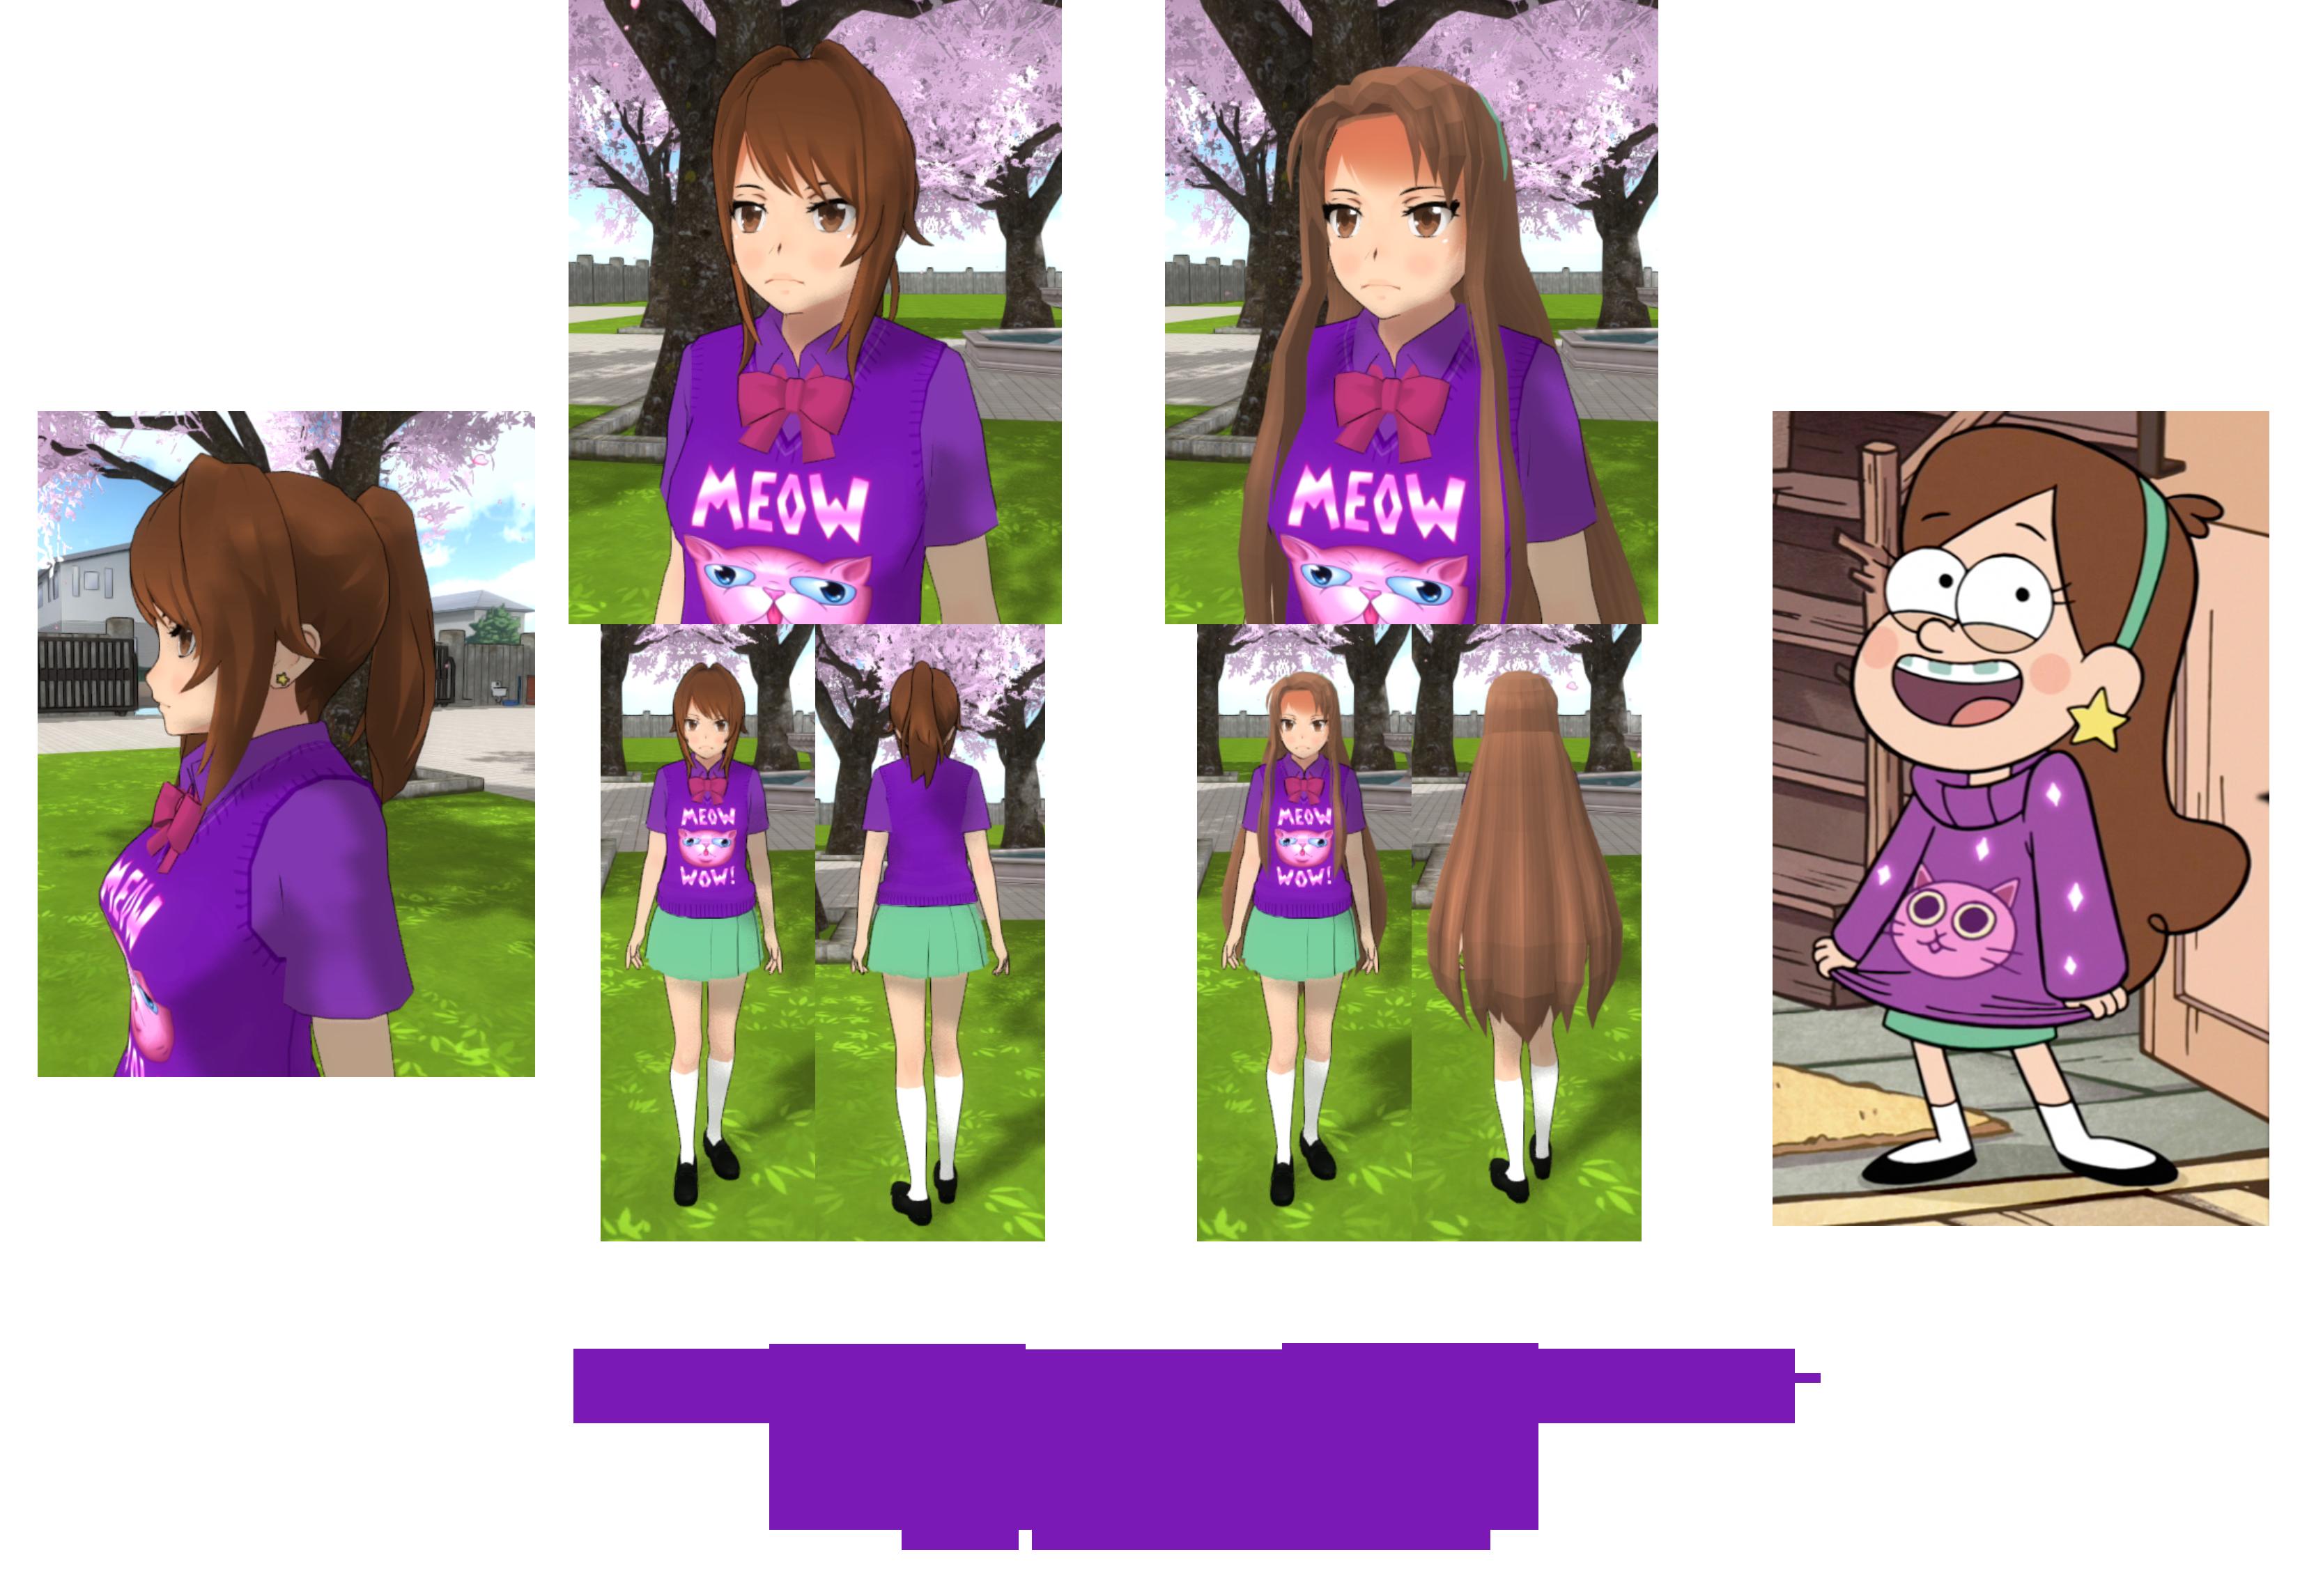 How to install sans undertale skin download sans undertale skin - Yandere Simulator Mabel Pines Skin By Imaginaryalchemist